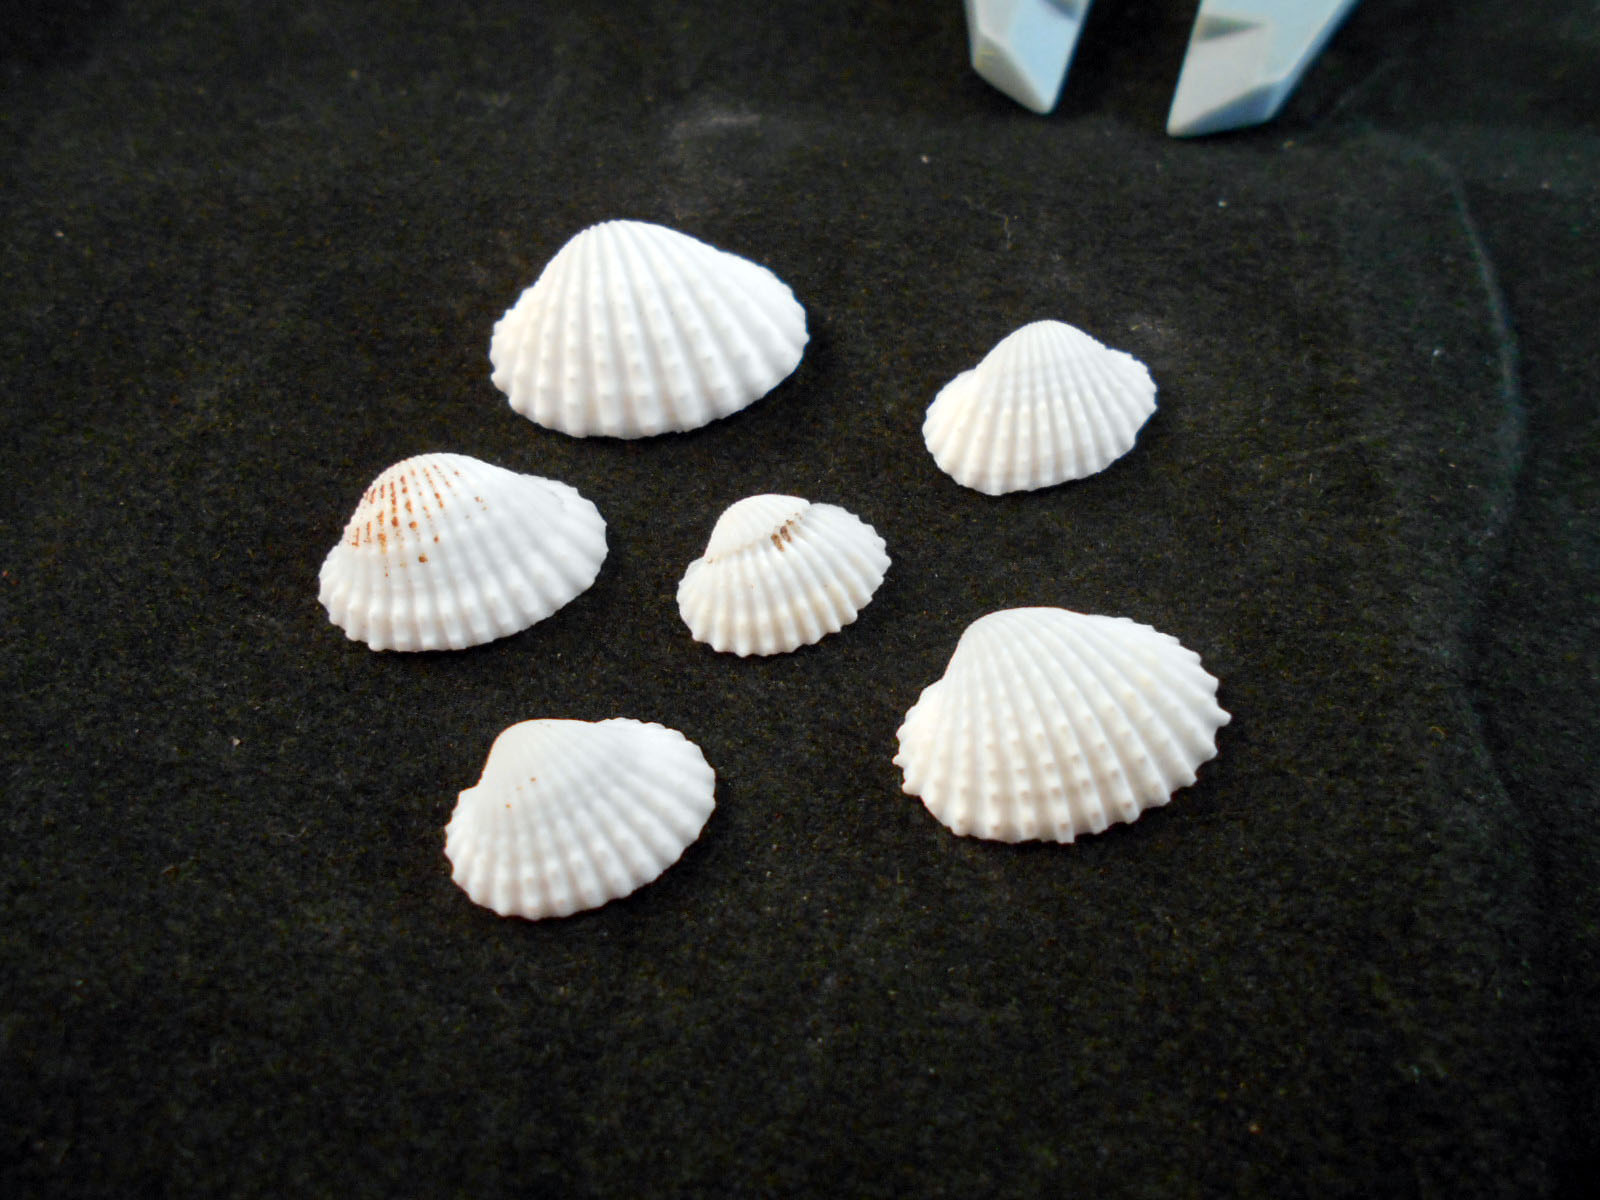 Tiny White Ark Shells Seashells Beach Wedding Hobby Craft Vase Filling 500+ 12-34 Bulk 1 Lb